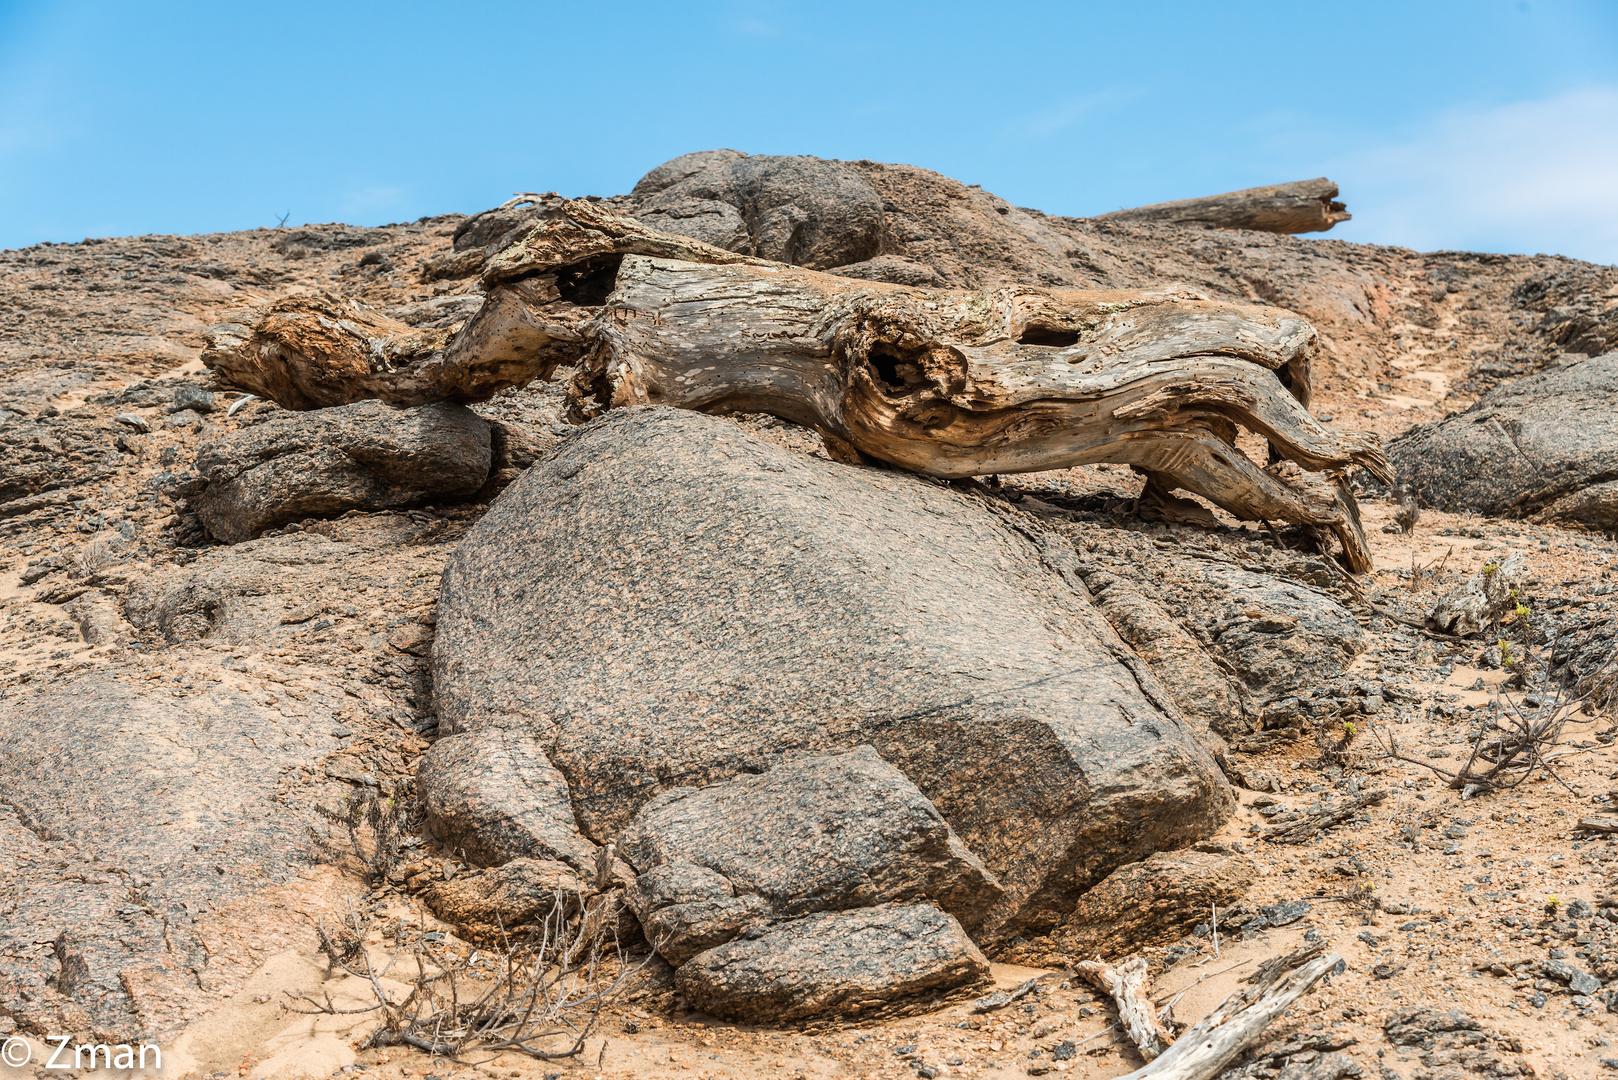 Namibia Wilderness 07